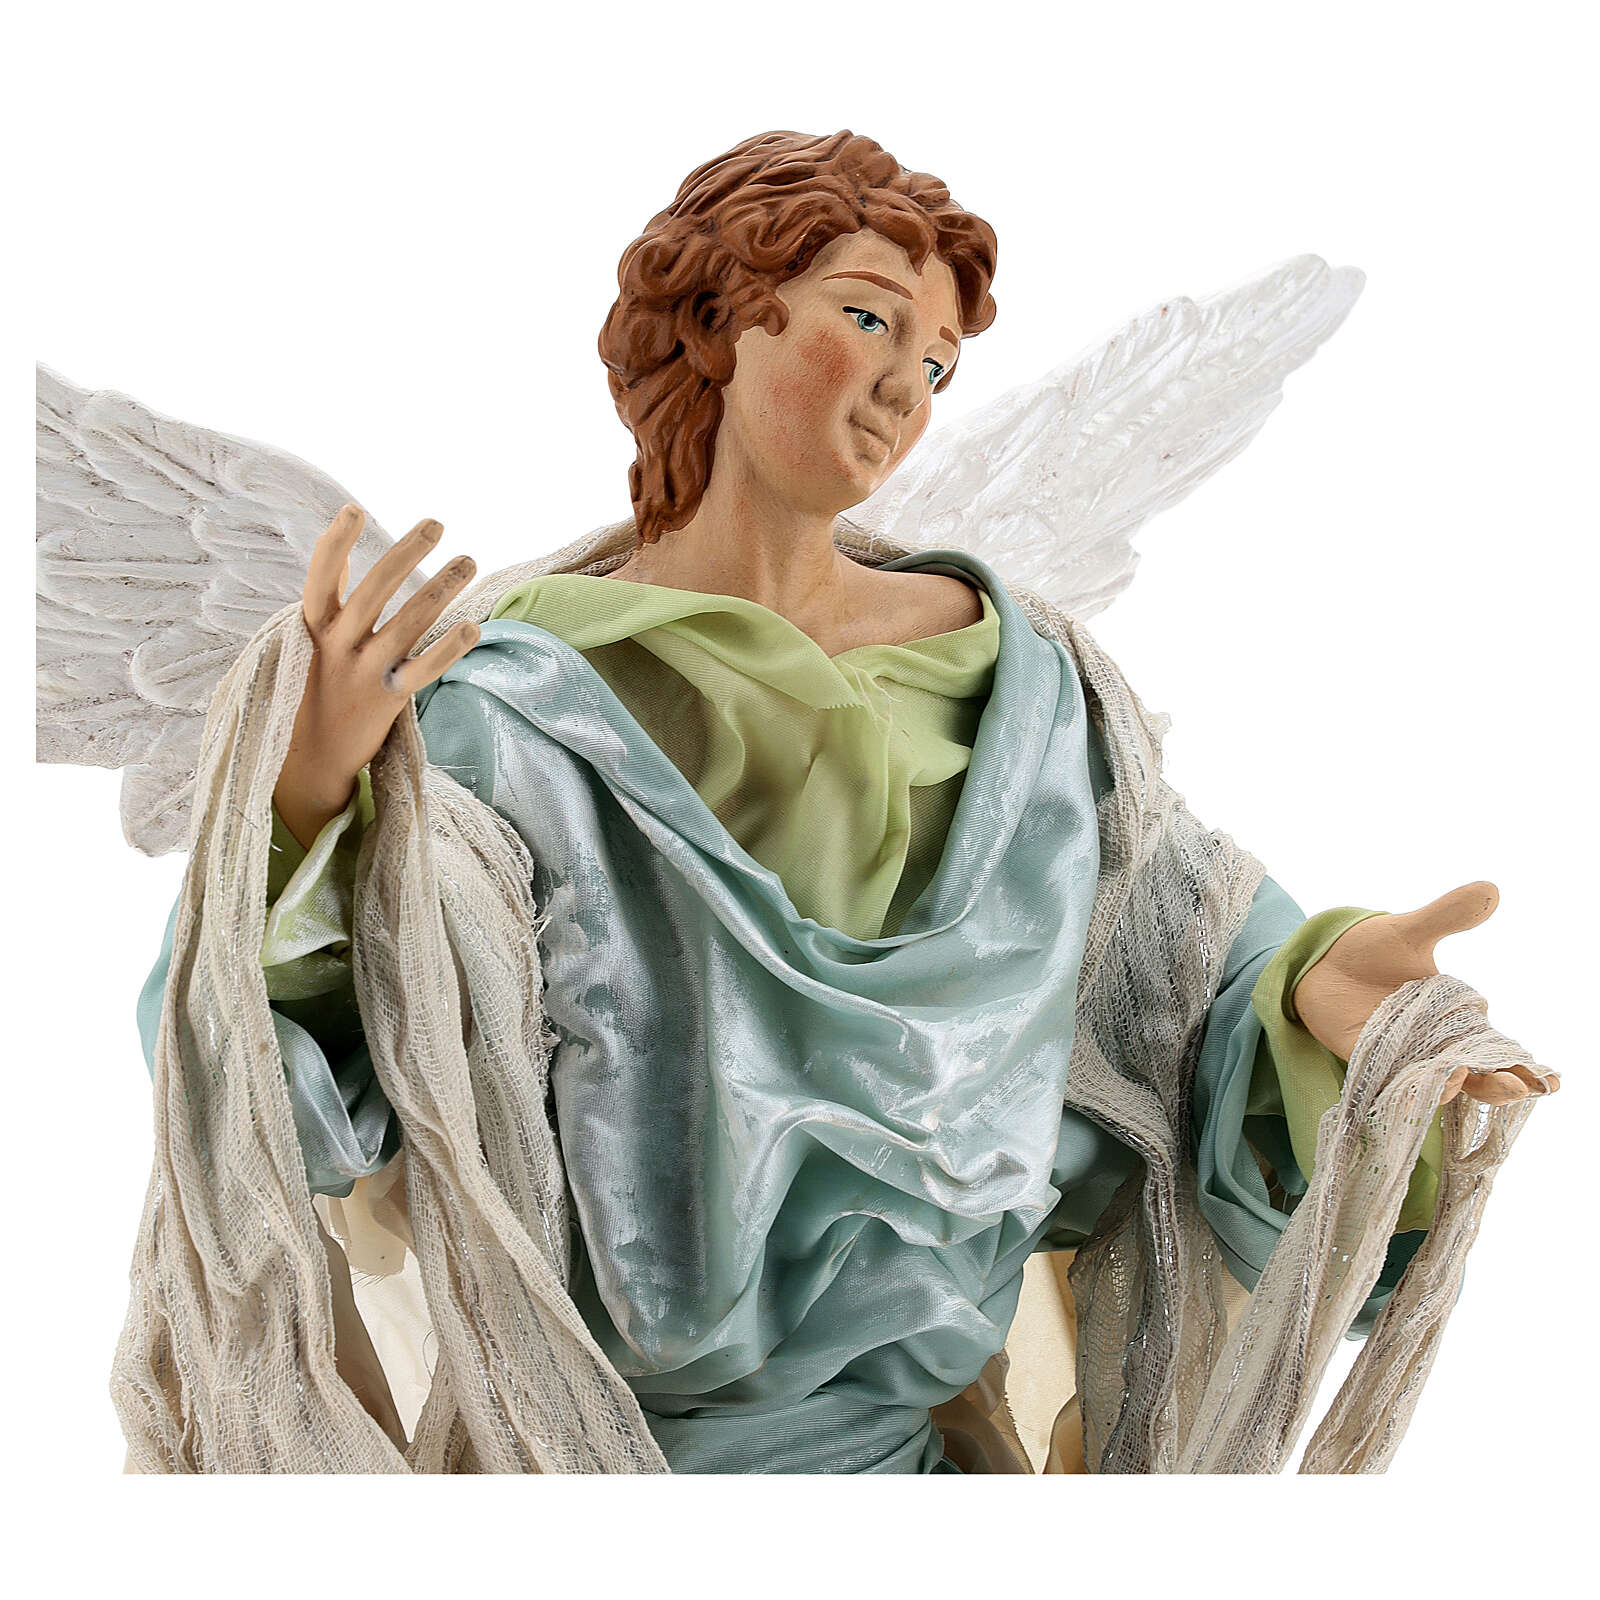 Ángel rubio belén napolitano 45 cm terracota tela pedestal 4